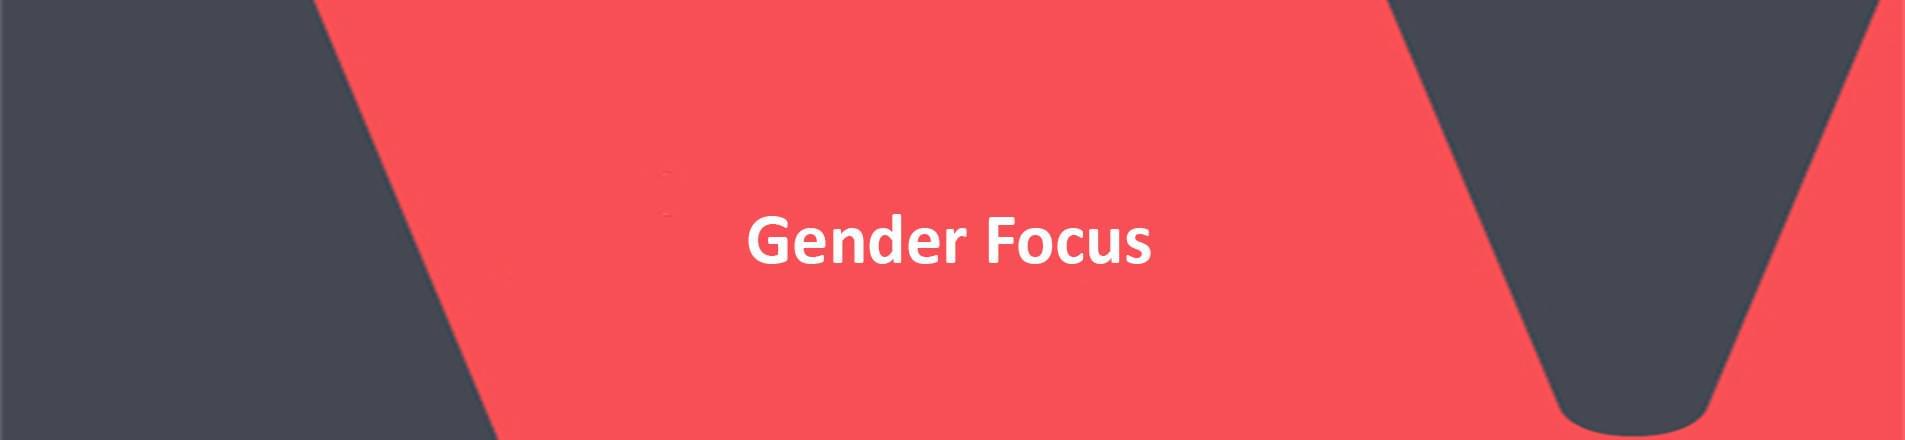 The words Gender Focus i white on a red VERCIDA branded background